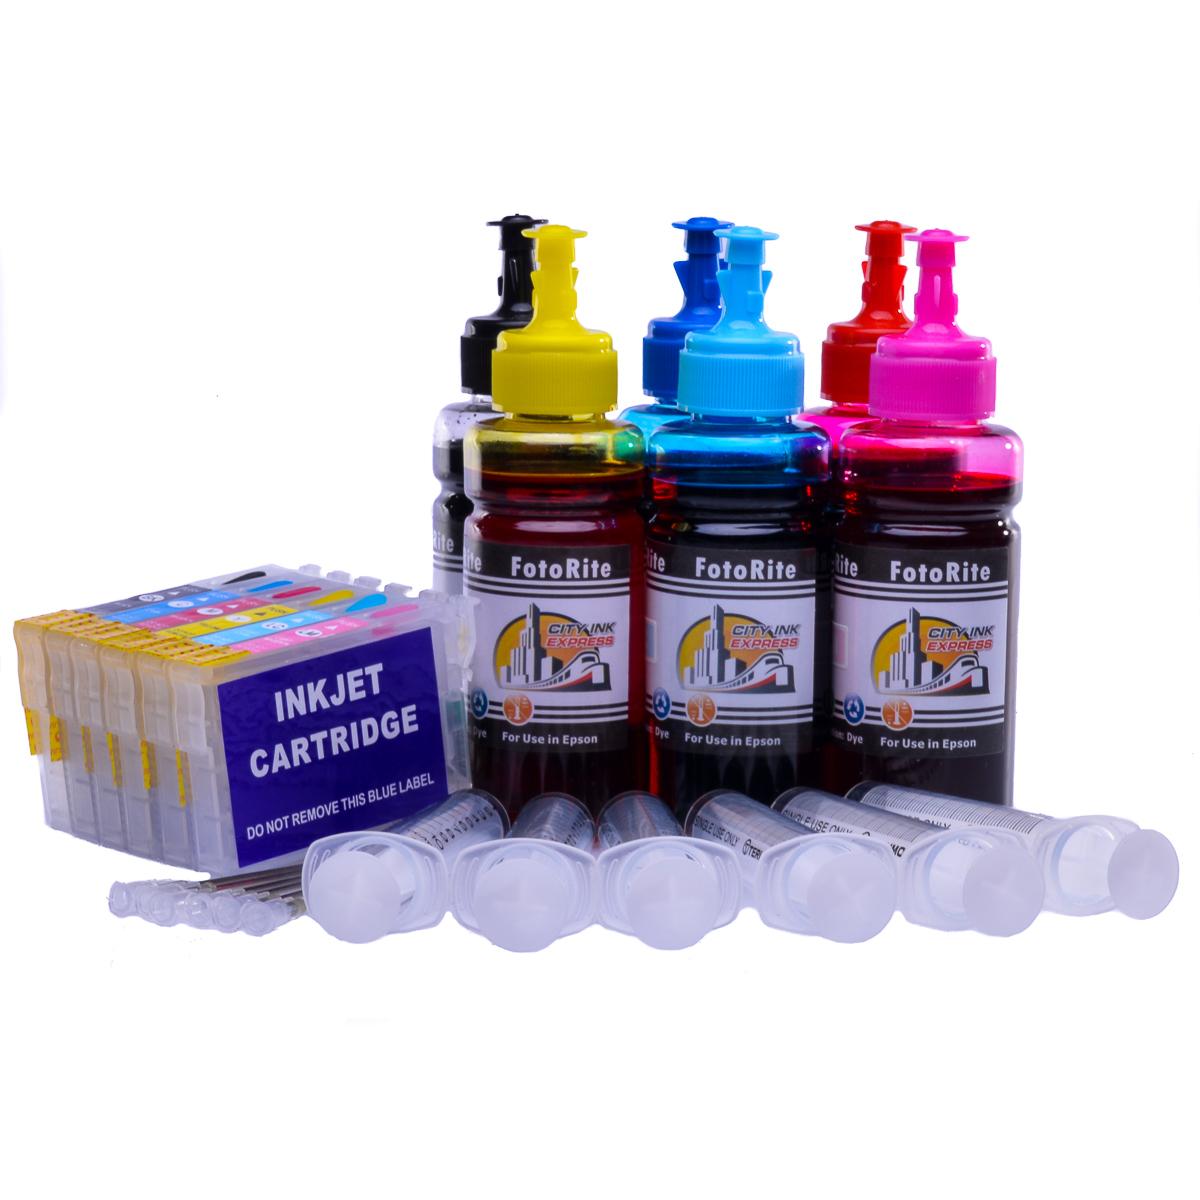 Refillable T0487 Multipack Cheap printer cartridges for Epson Stylus RX630 C13T04874010 dye ink